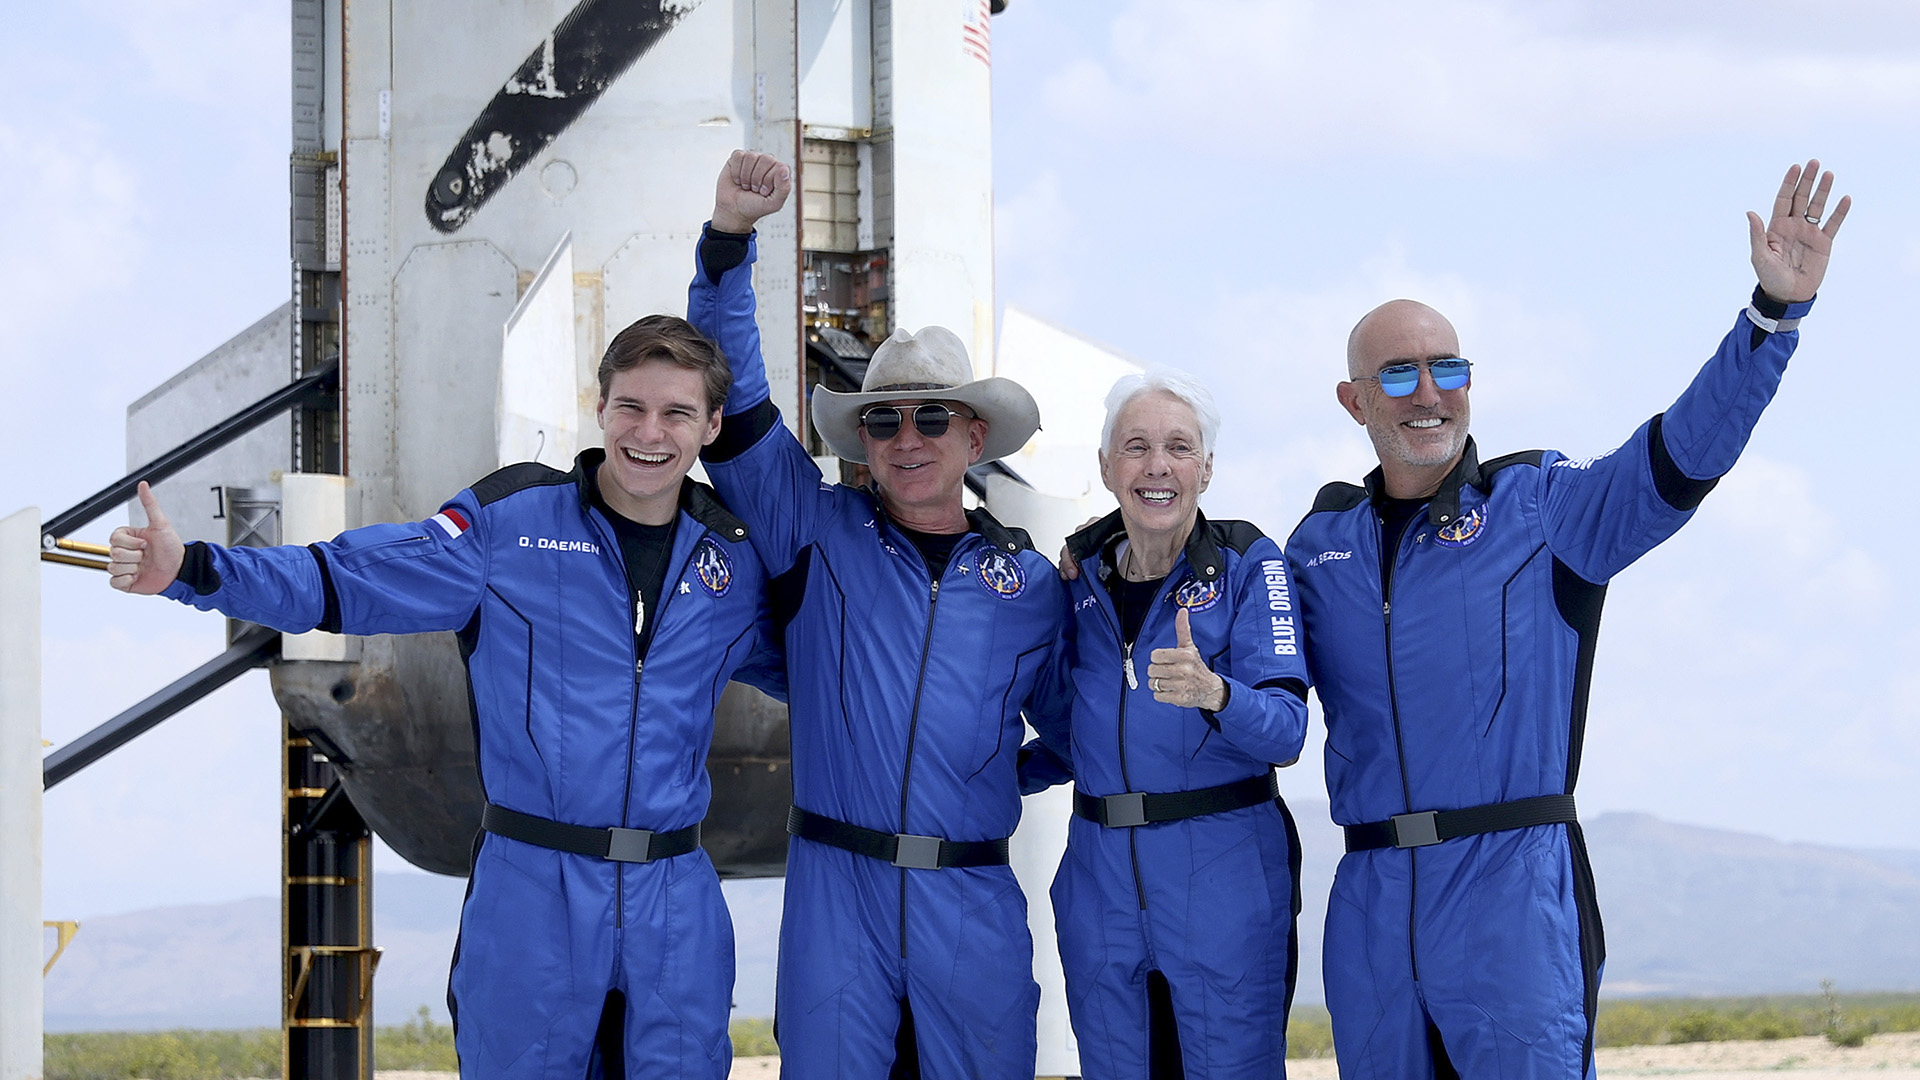 American Billionaire Jeff Bezos, Blue Origin Crew Successfully Complete Spaceflight